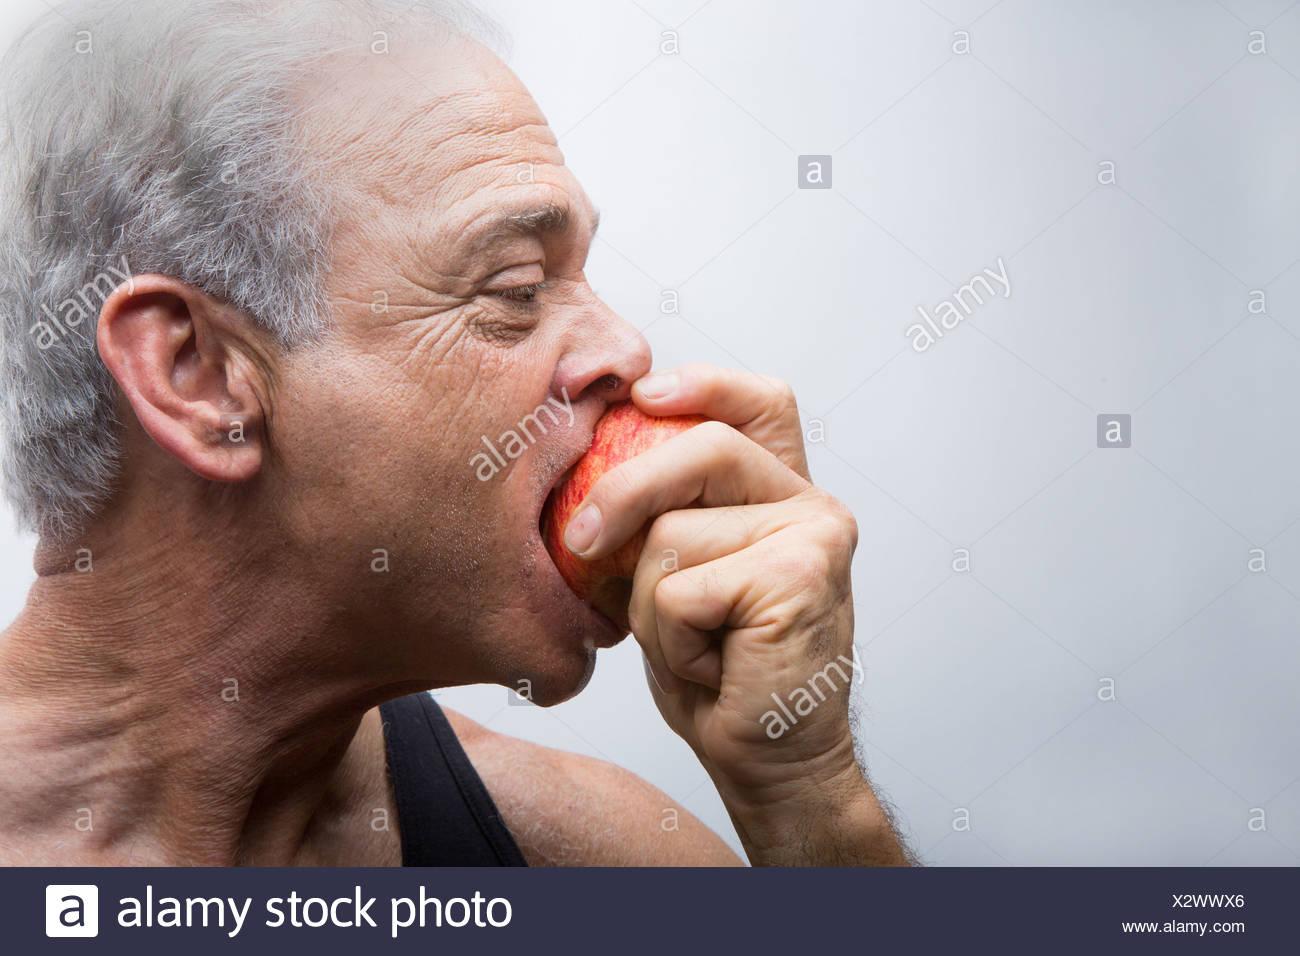 Senior man eating apple, close up - Stock Image